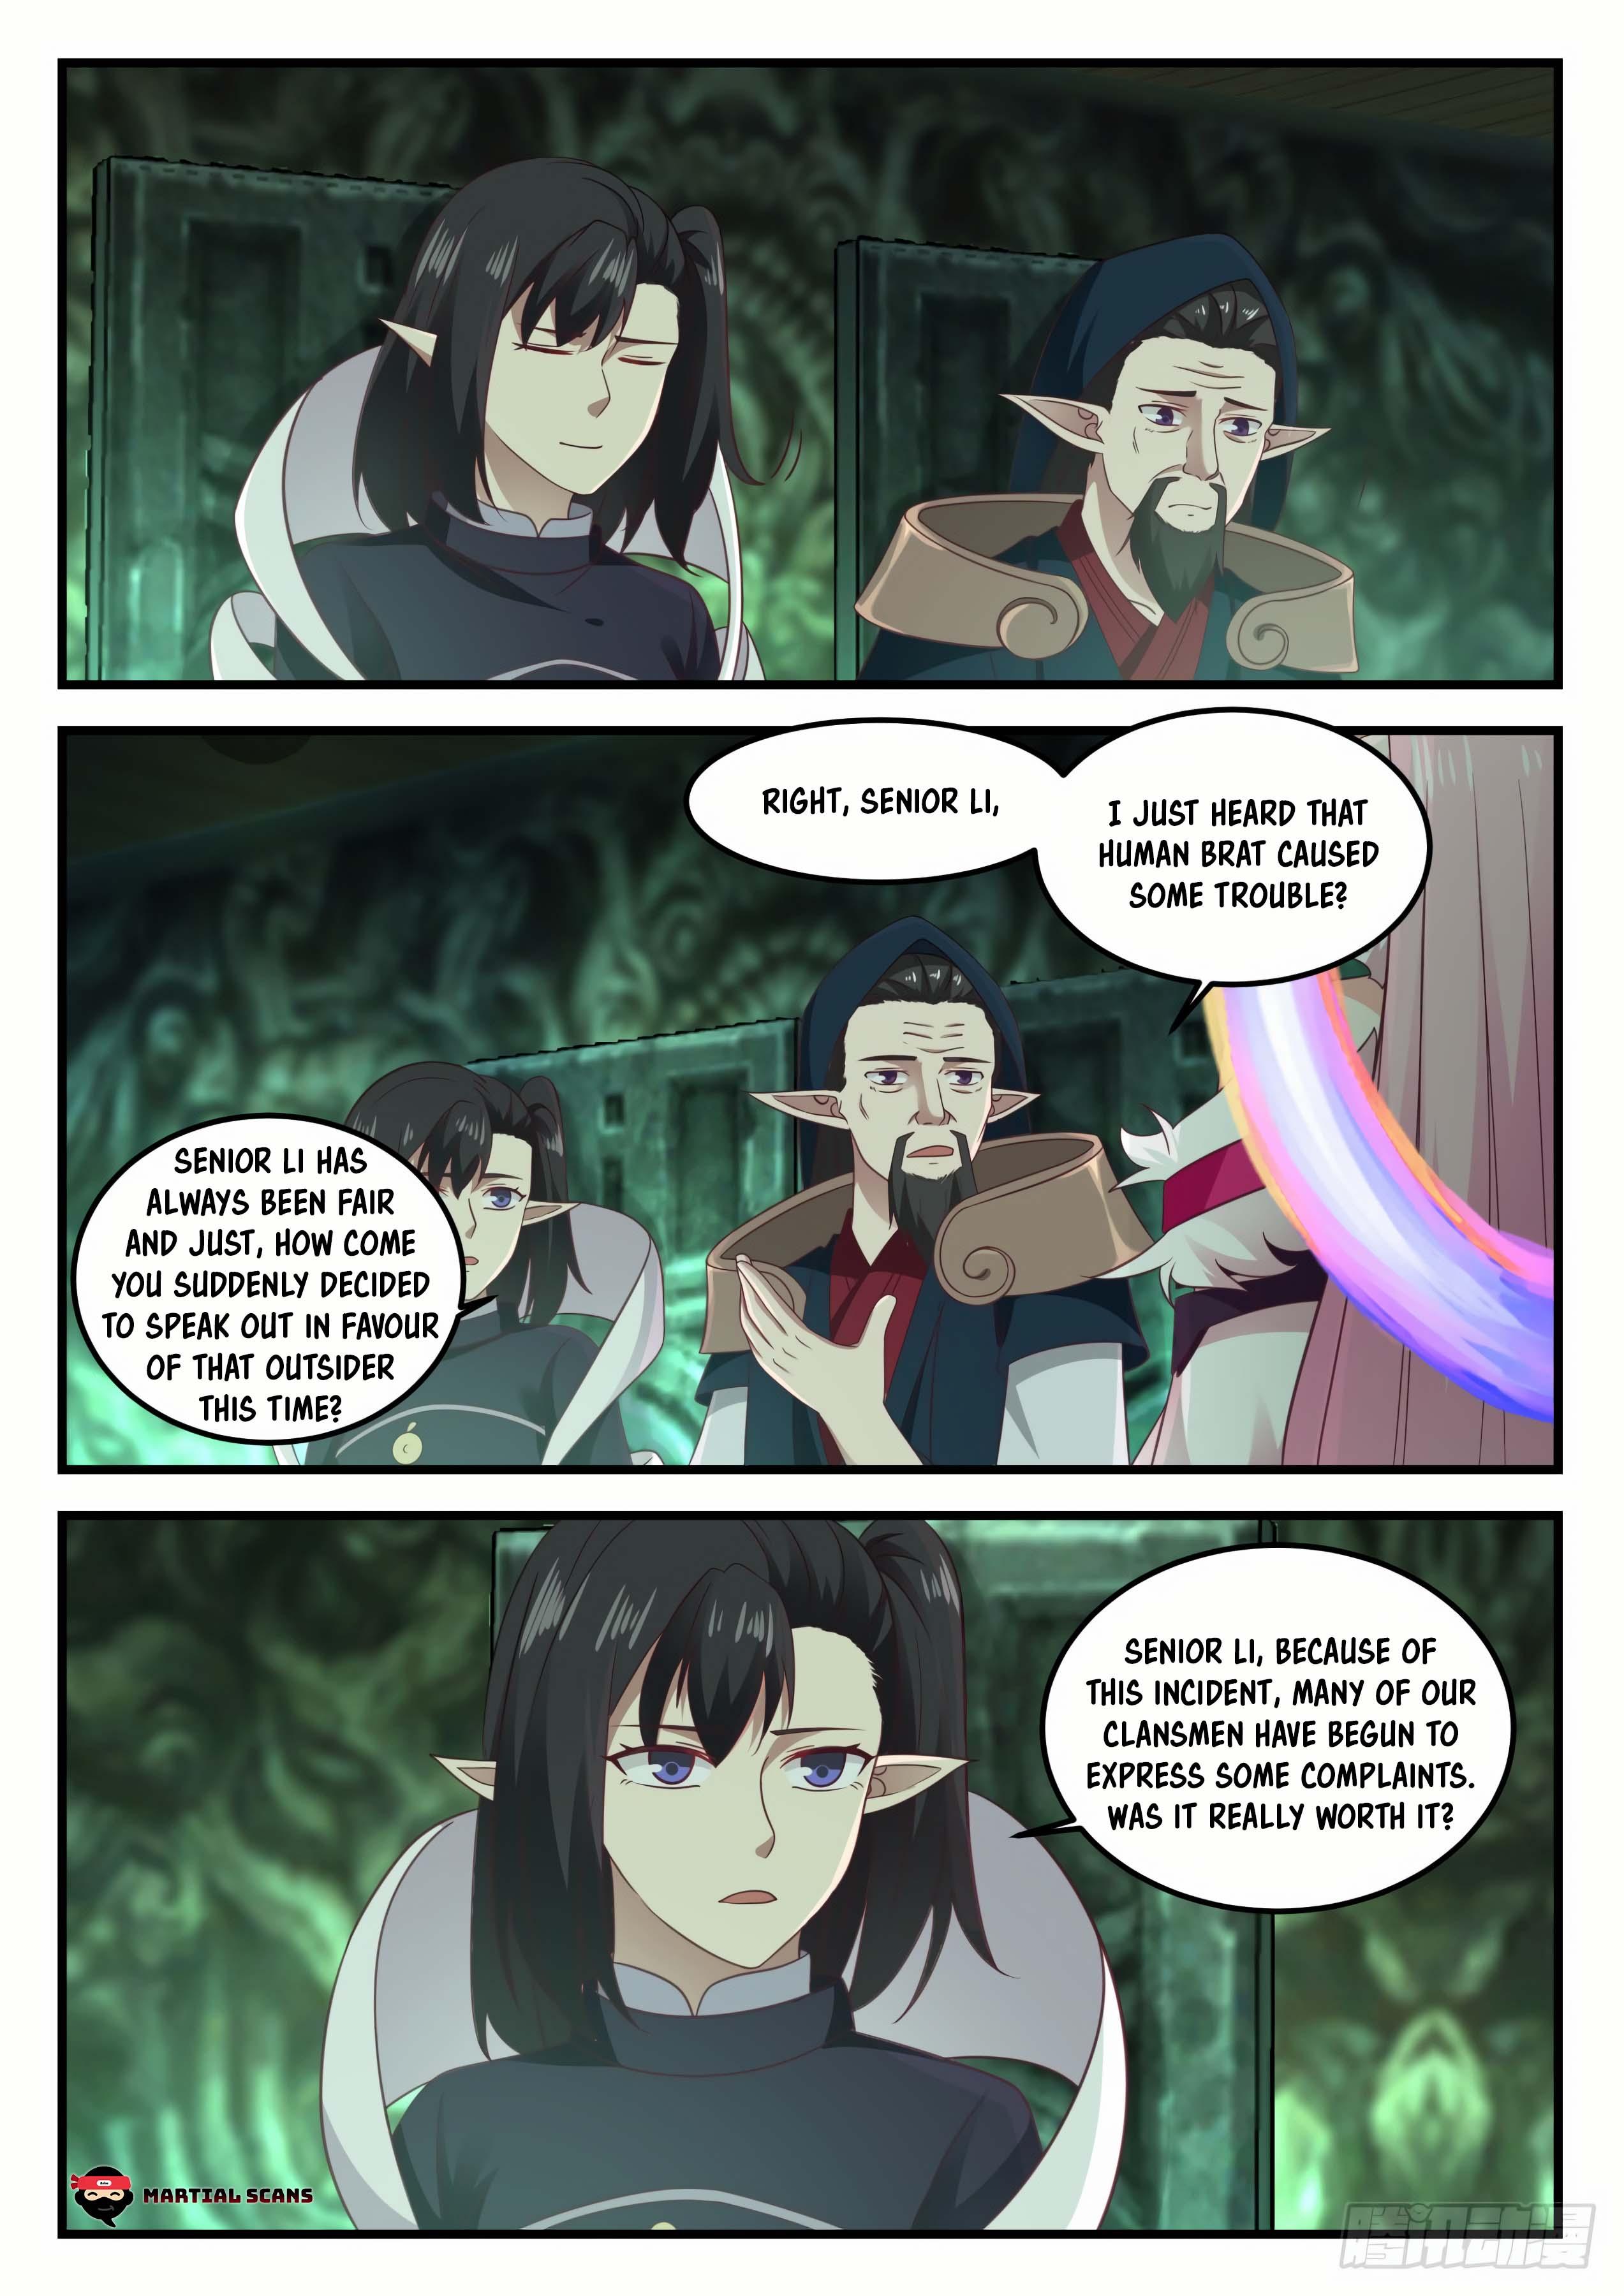 Martial Peak - chapter 623-eng-li